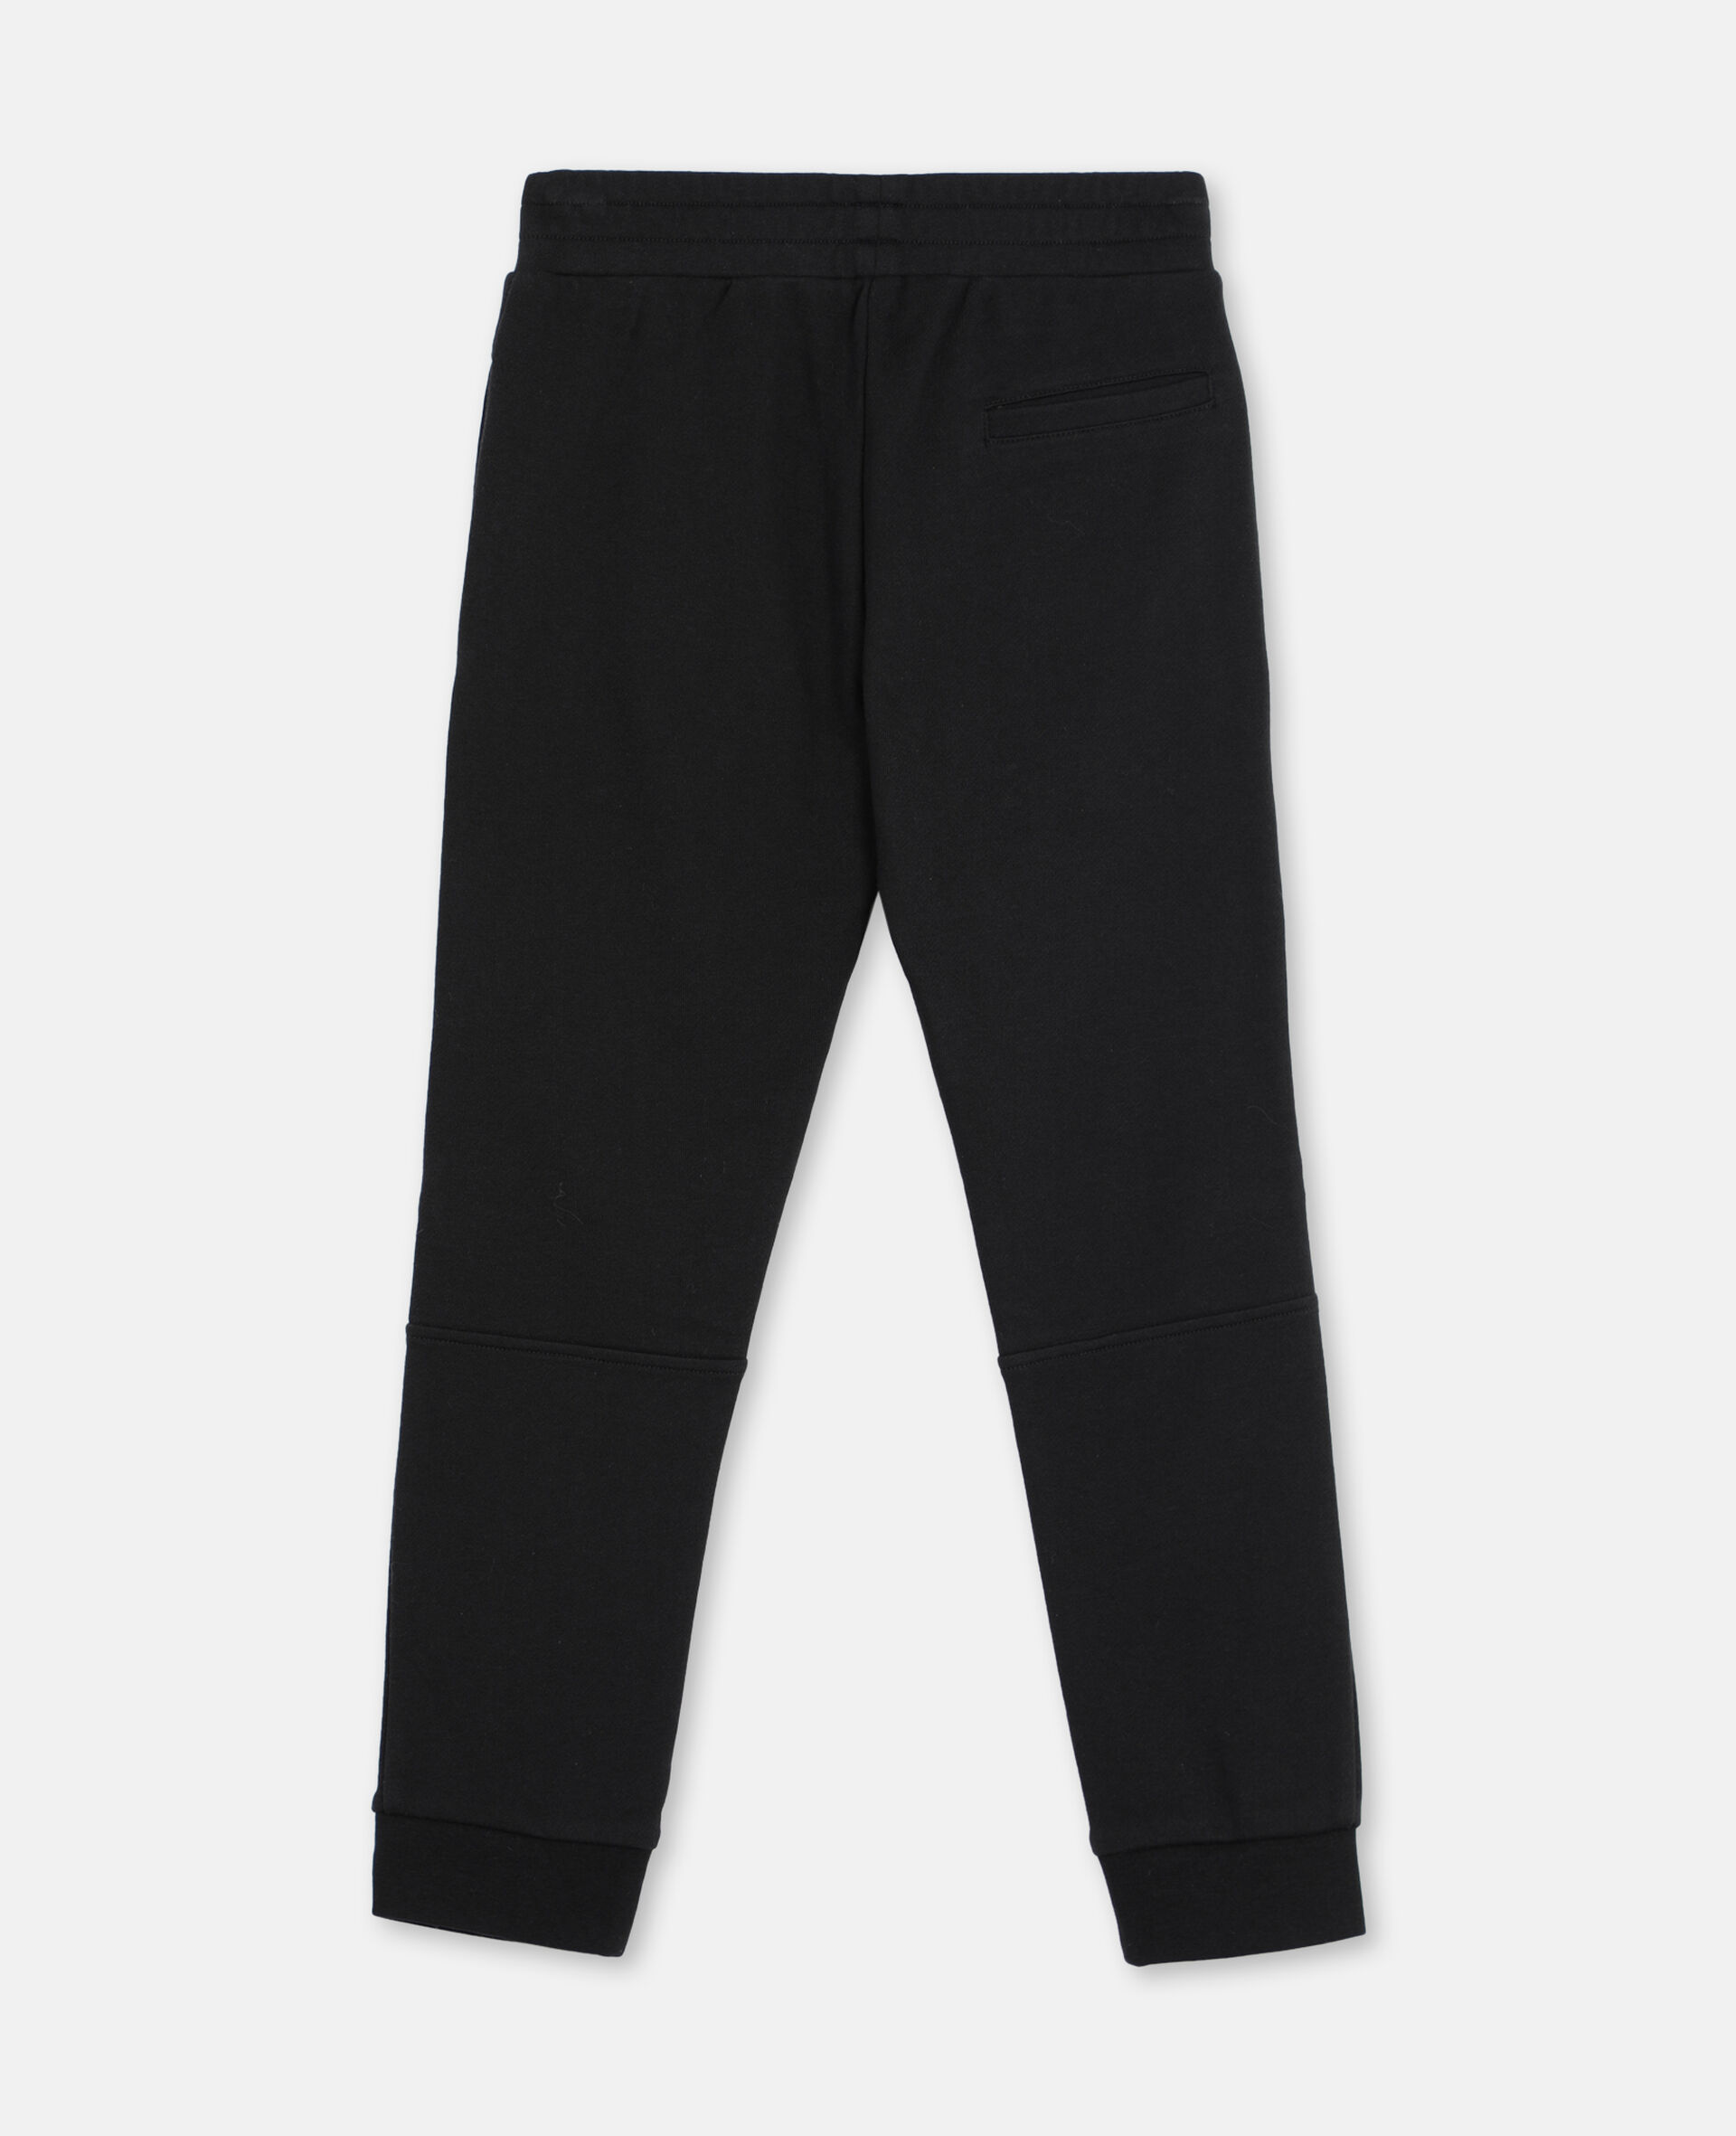 Basic 棉质运动裤 -黑色-large image number 3